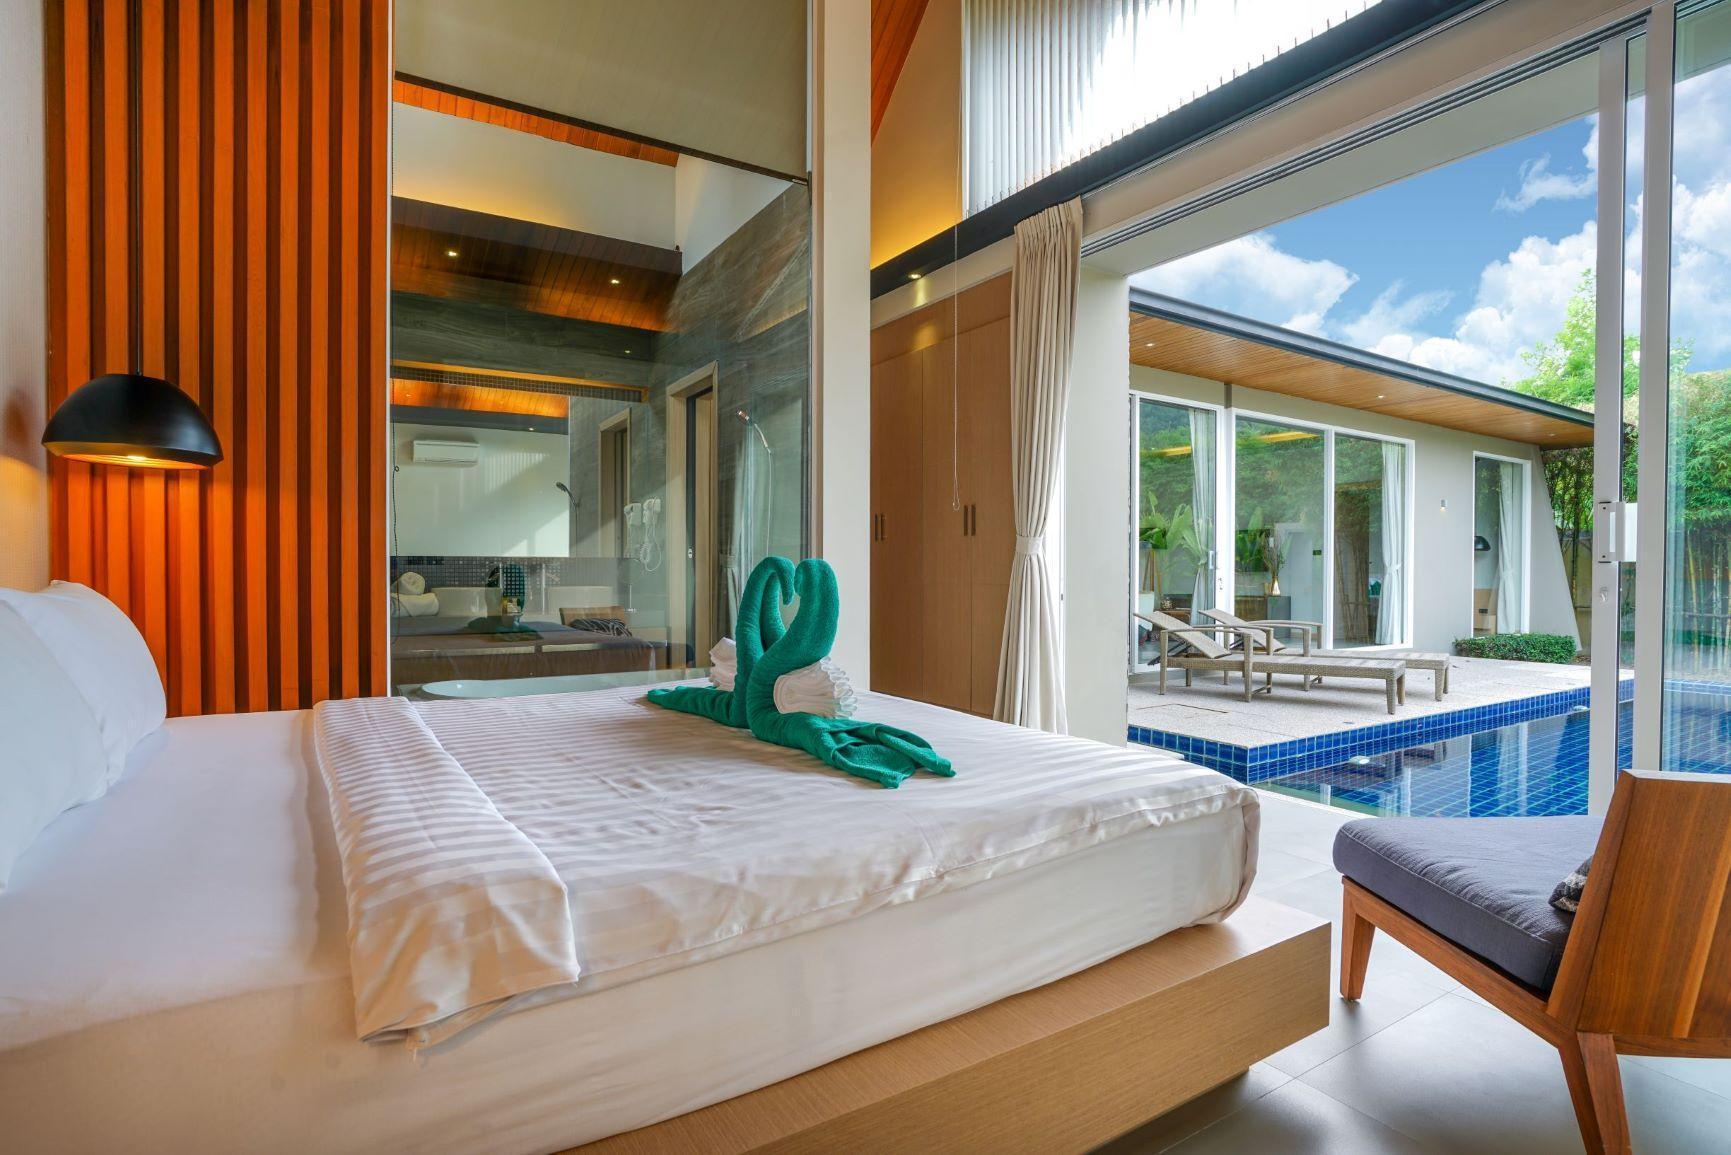 3 BDR Sunpao Pool Villa at Layan Phuket วิลลา 3 ห้องนอน 3 ห้องน้ำส่วนตัว ขนาด 177 ตร.ม. – ลายัน